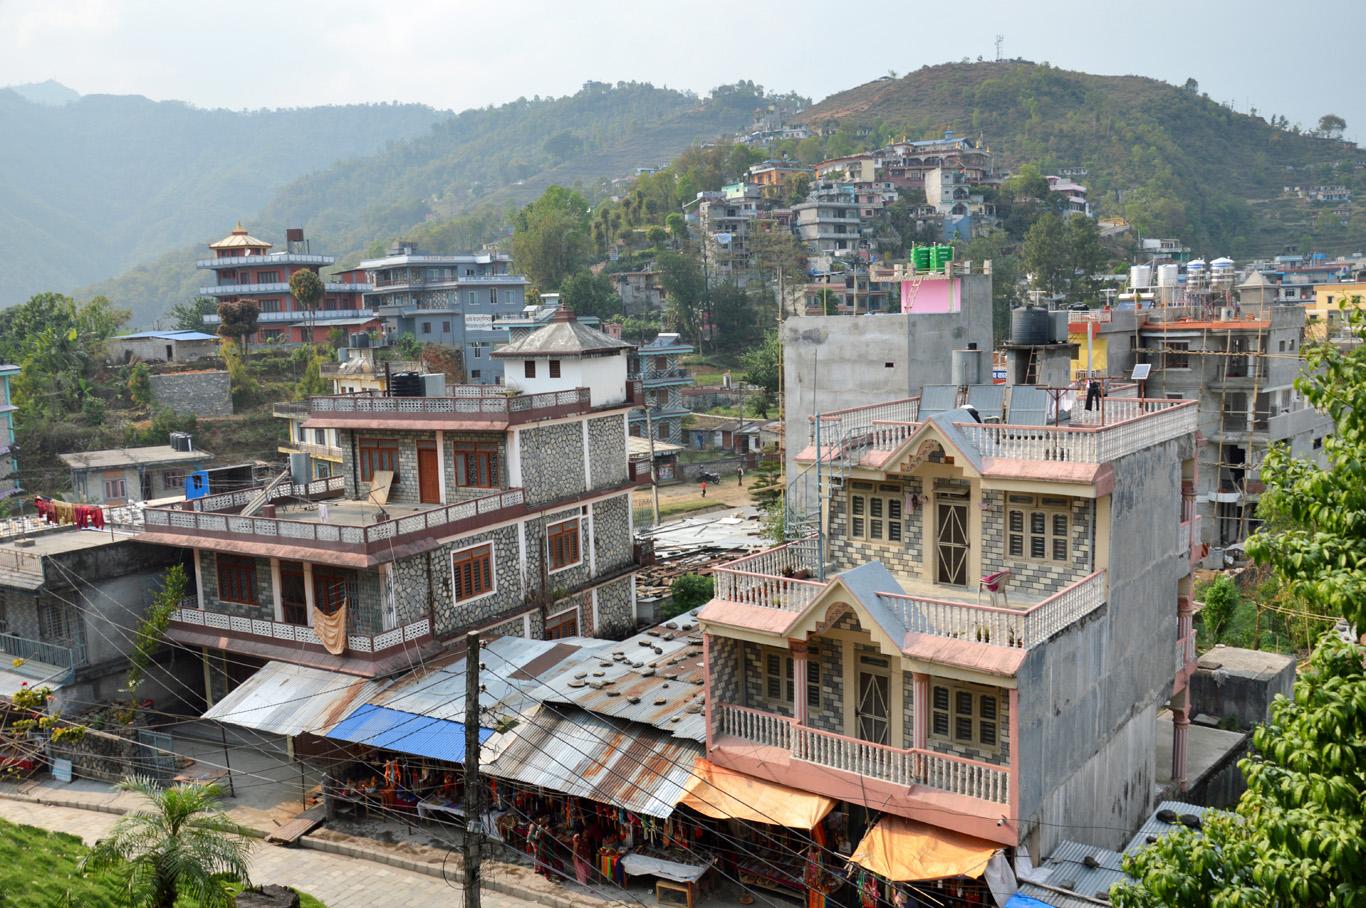 Buildings in Pokhara